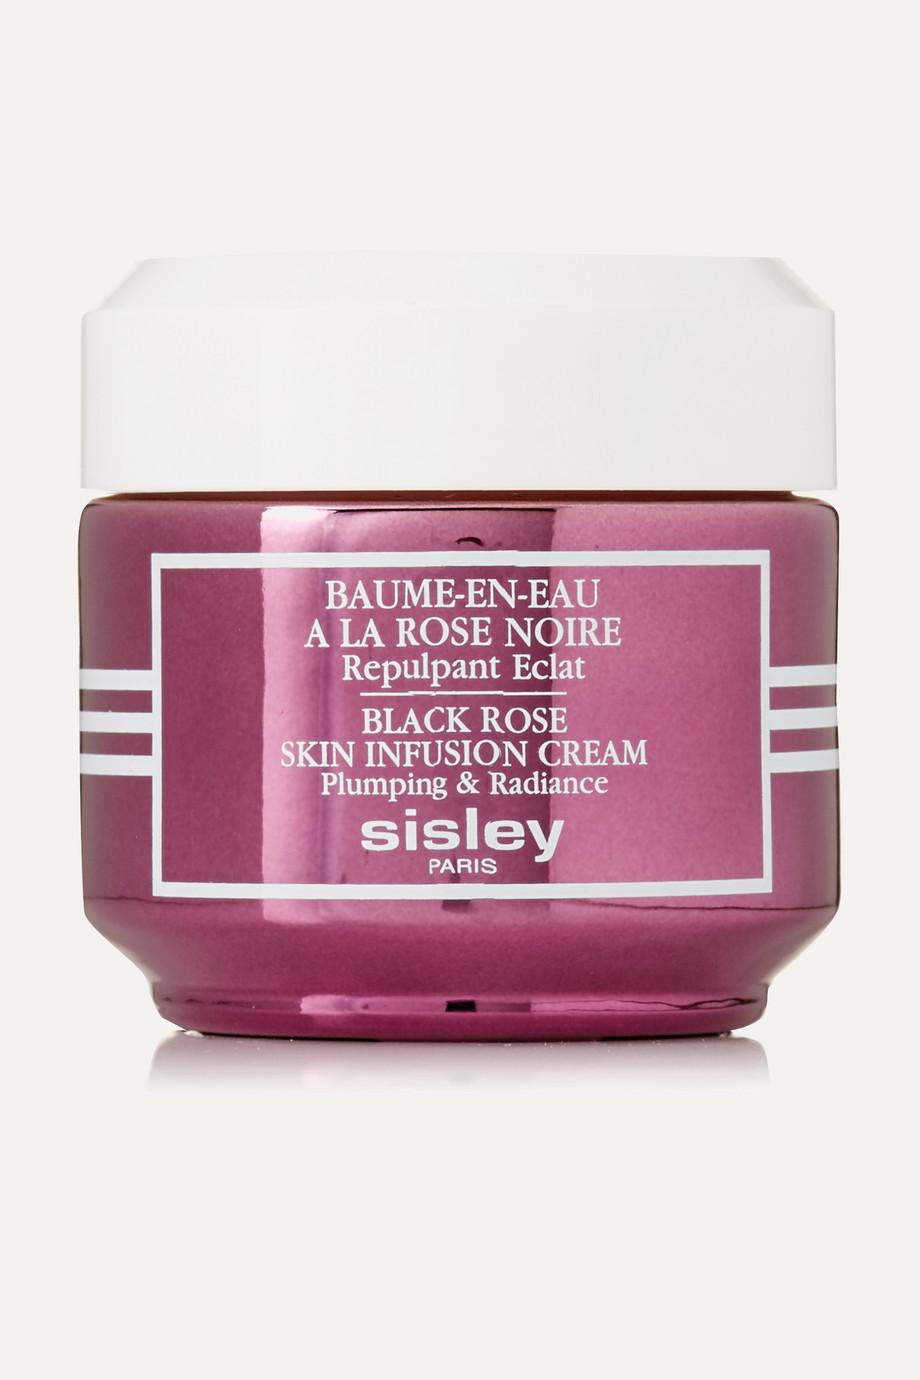 Sisley Black Rose Skin Infusion Cream, 50 ml – Gesichtscreme